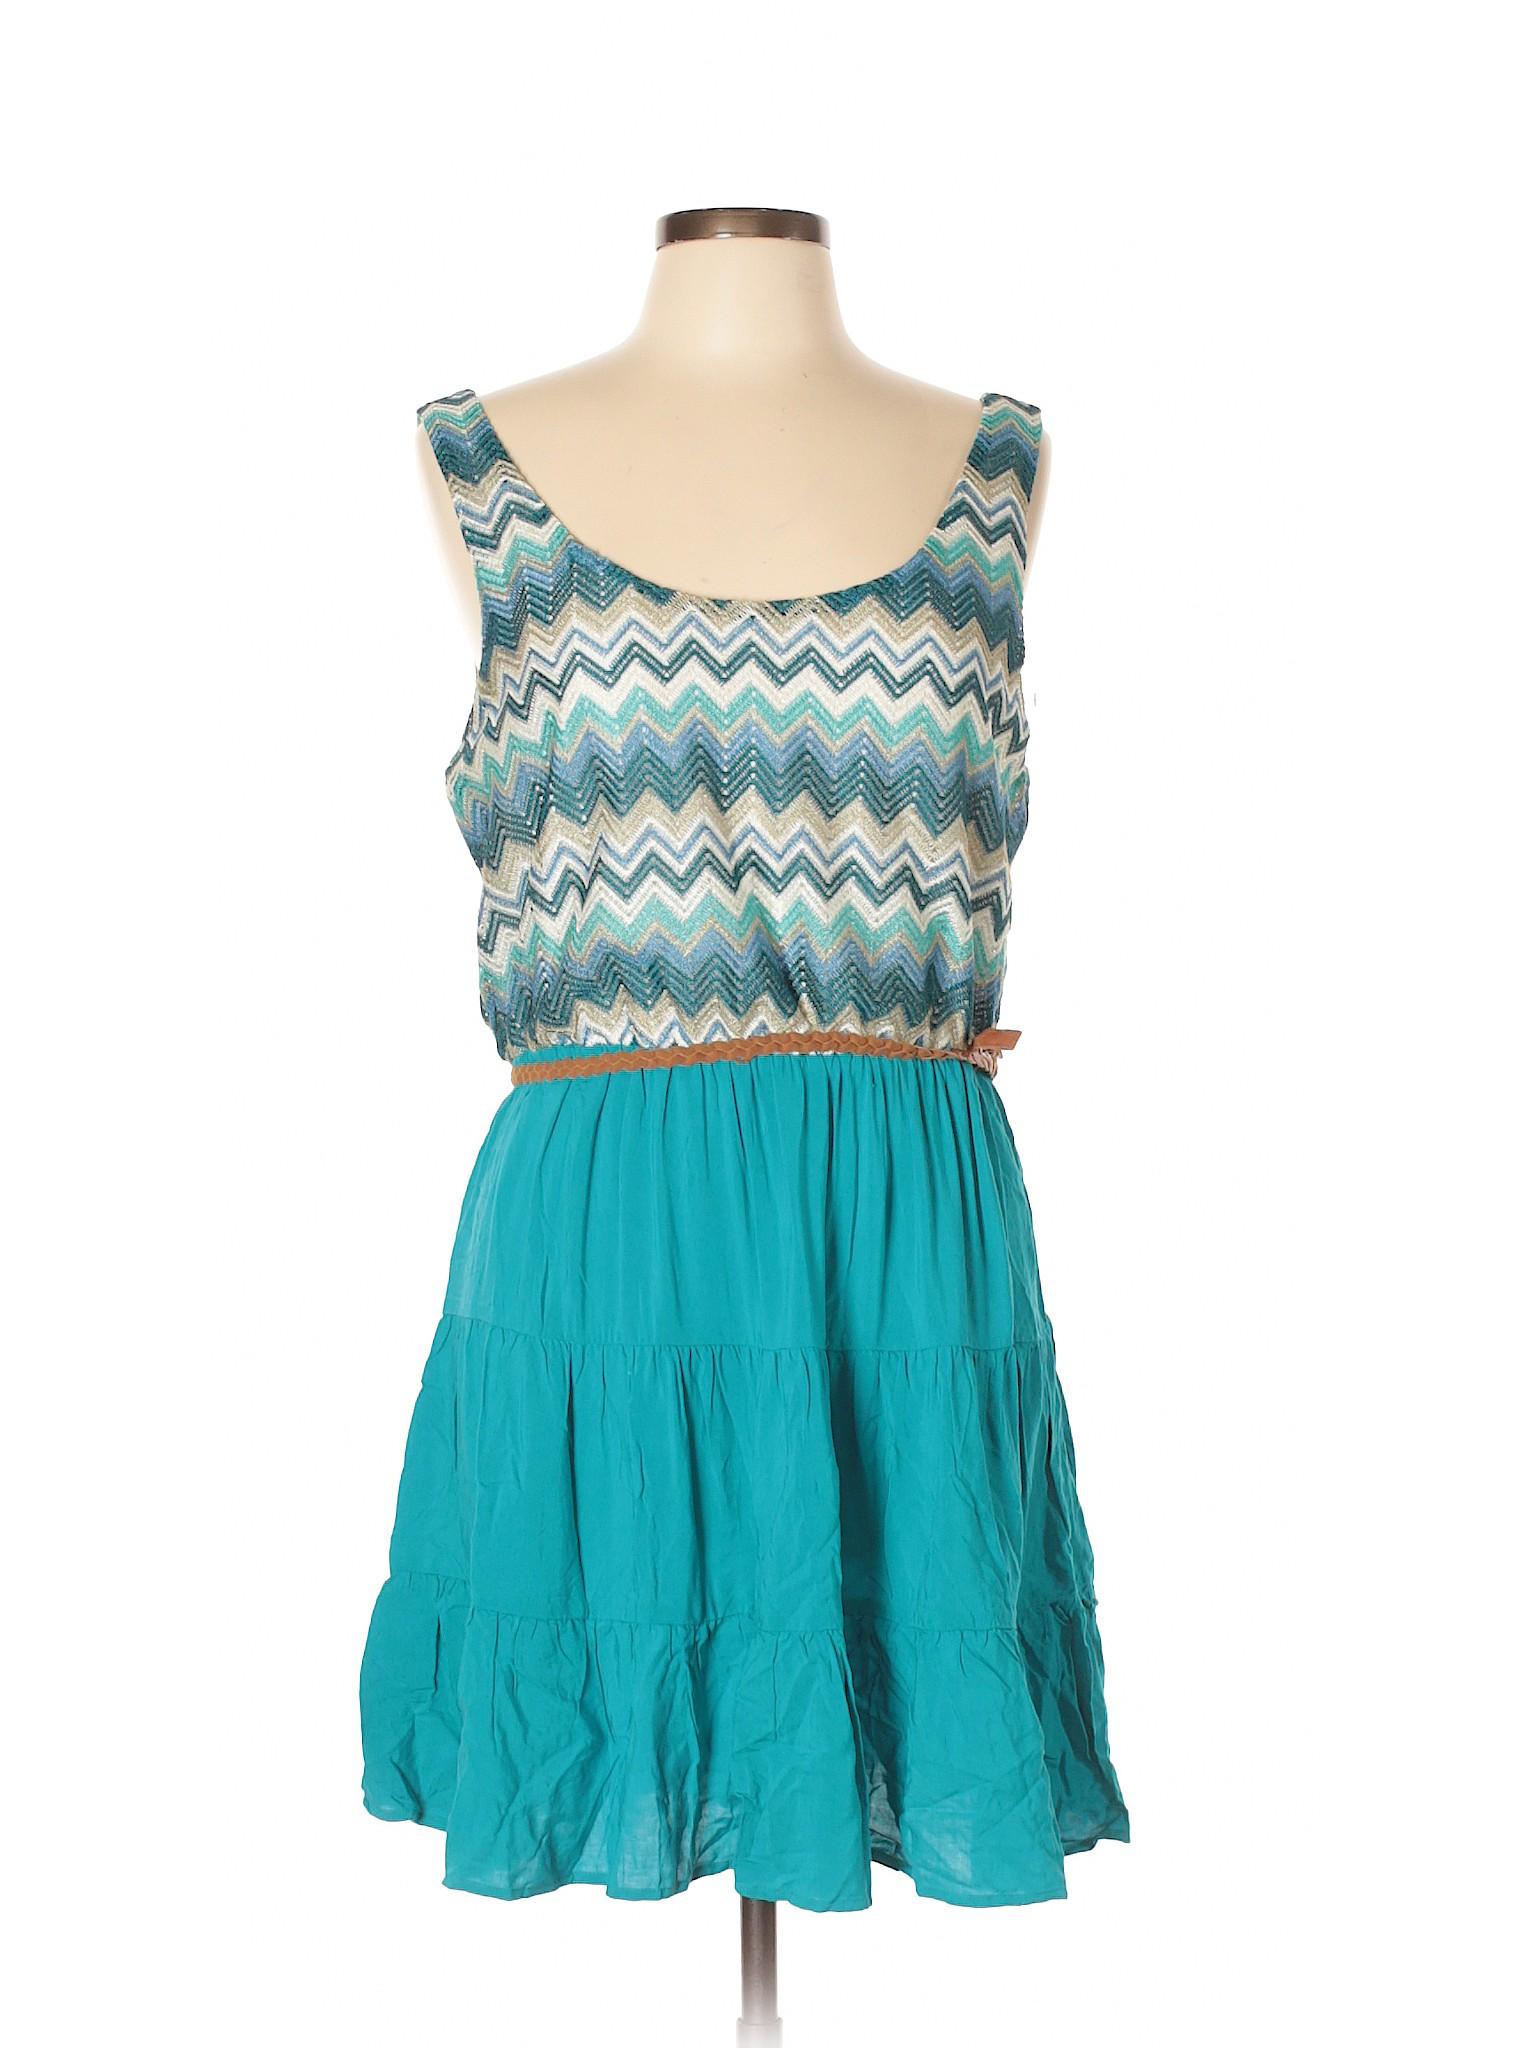 As Casual Boutique Dress U winter Wish YBWq5f